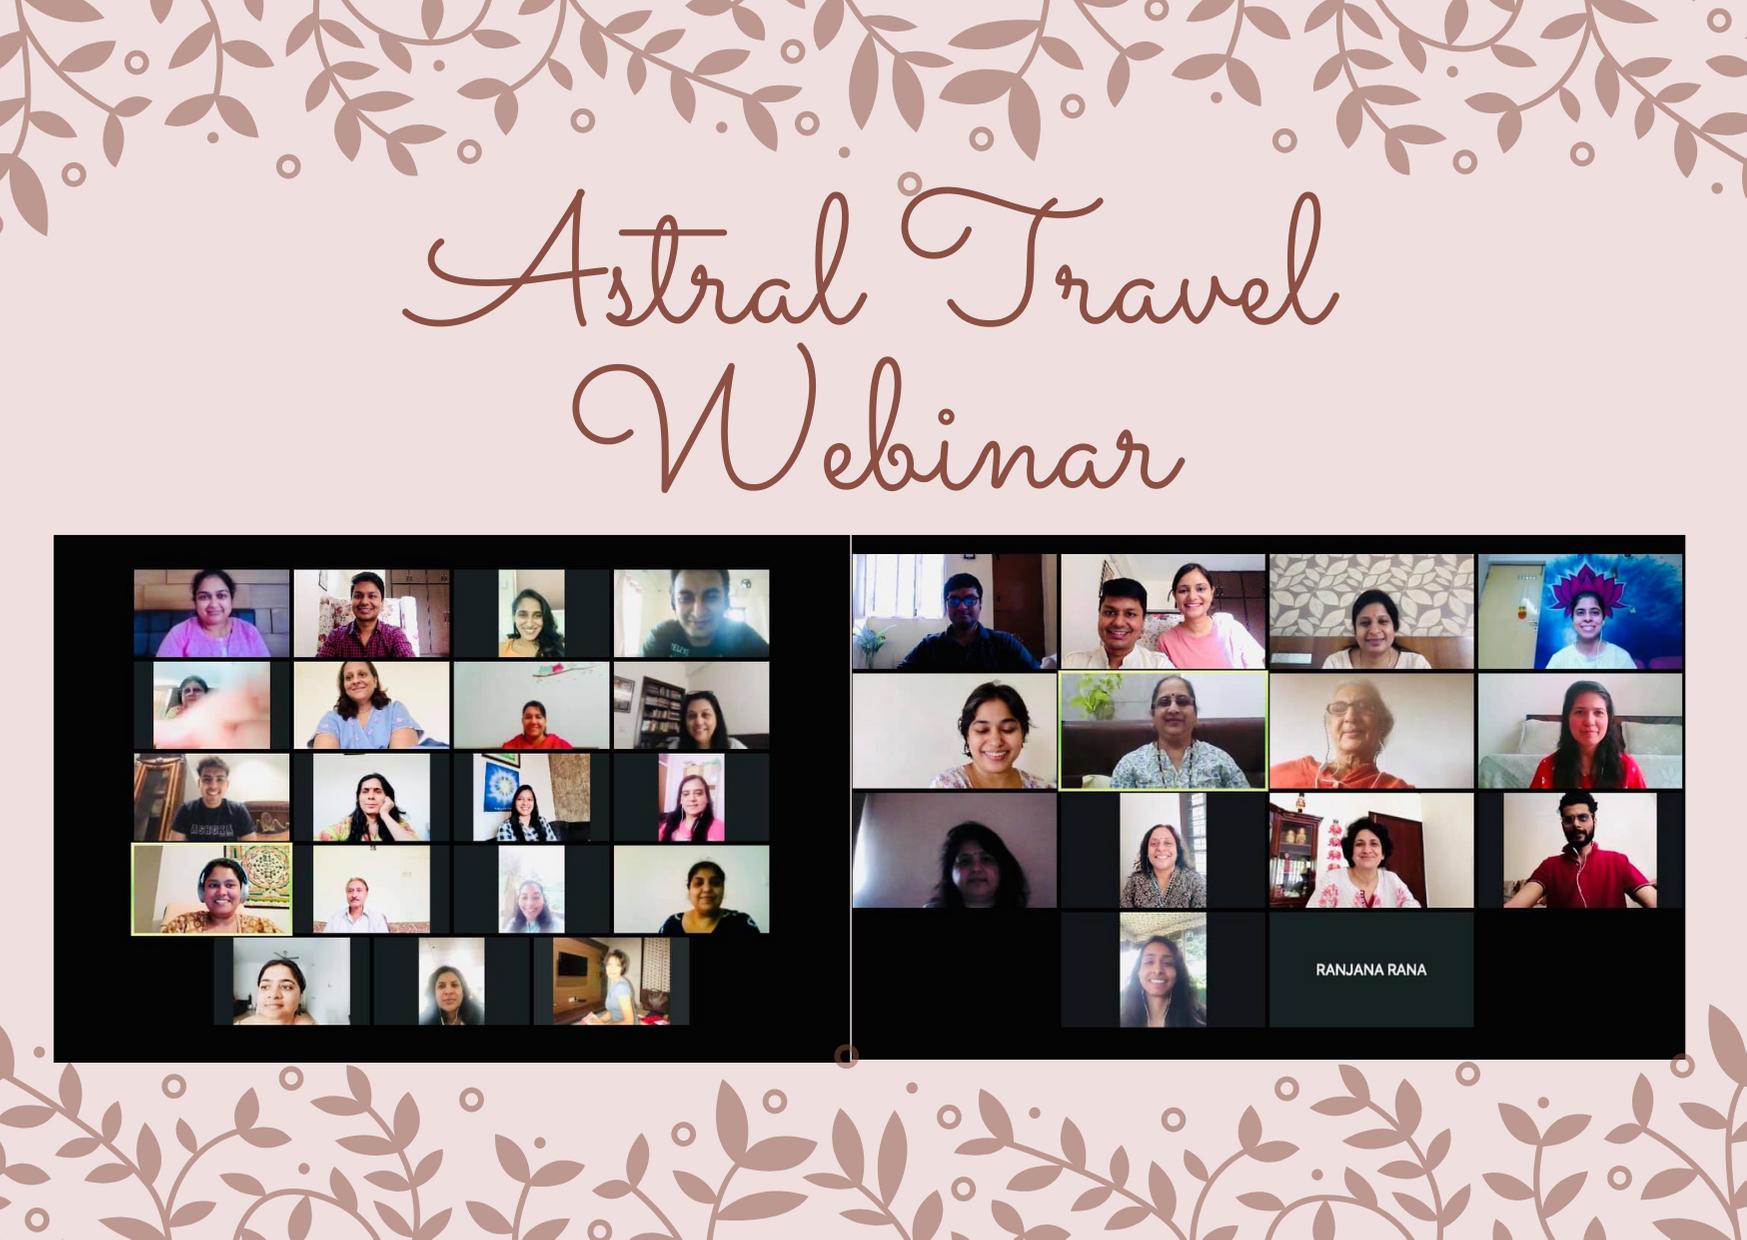 Astral Travel Webinar (2020)